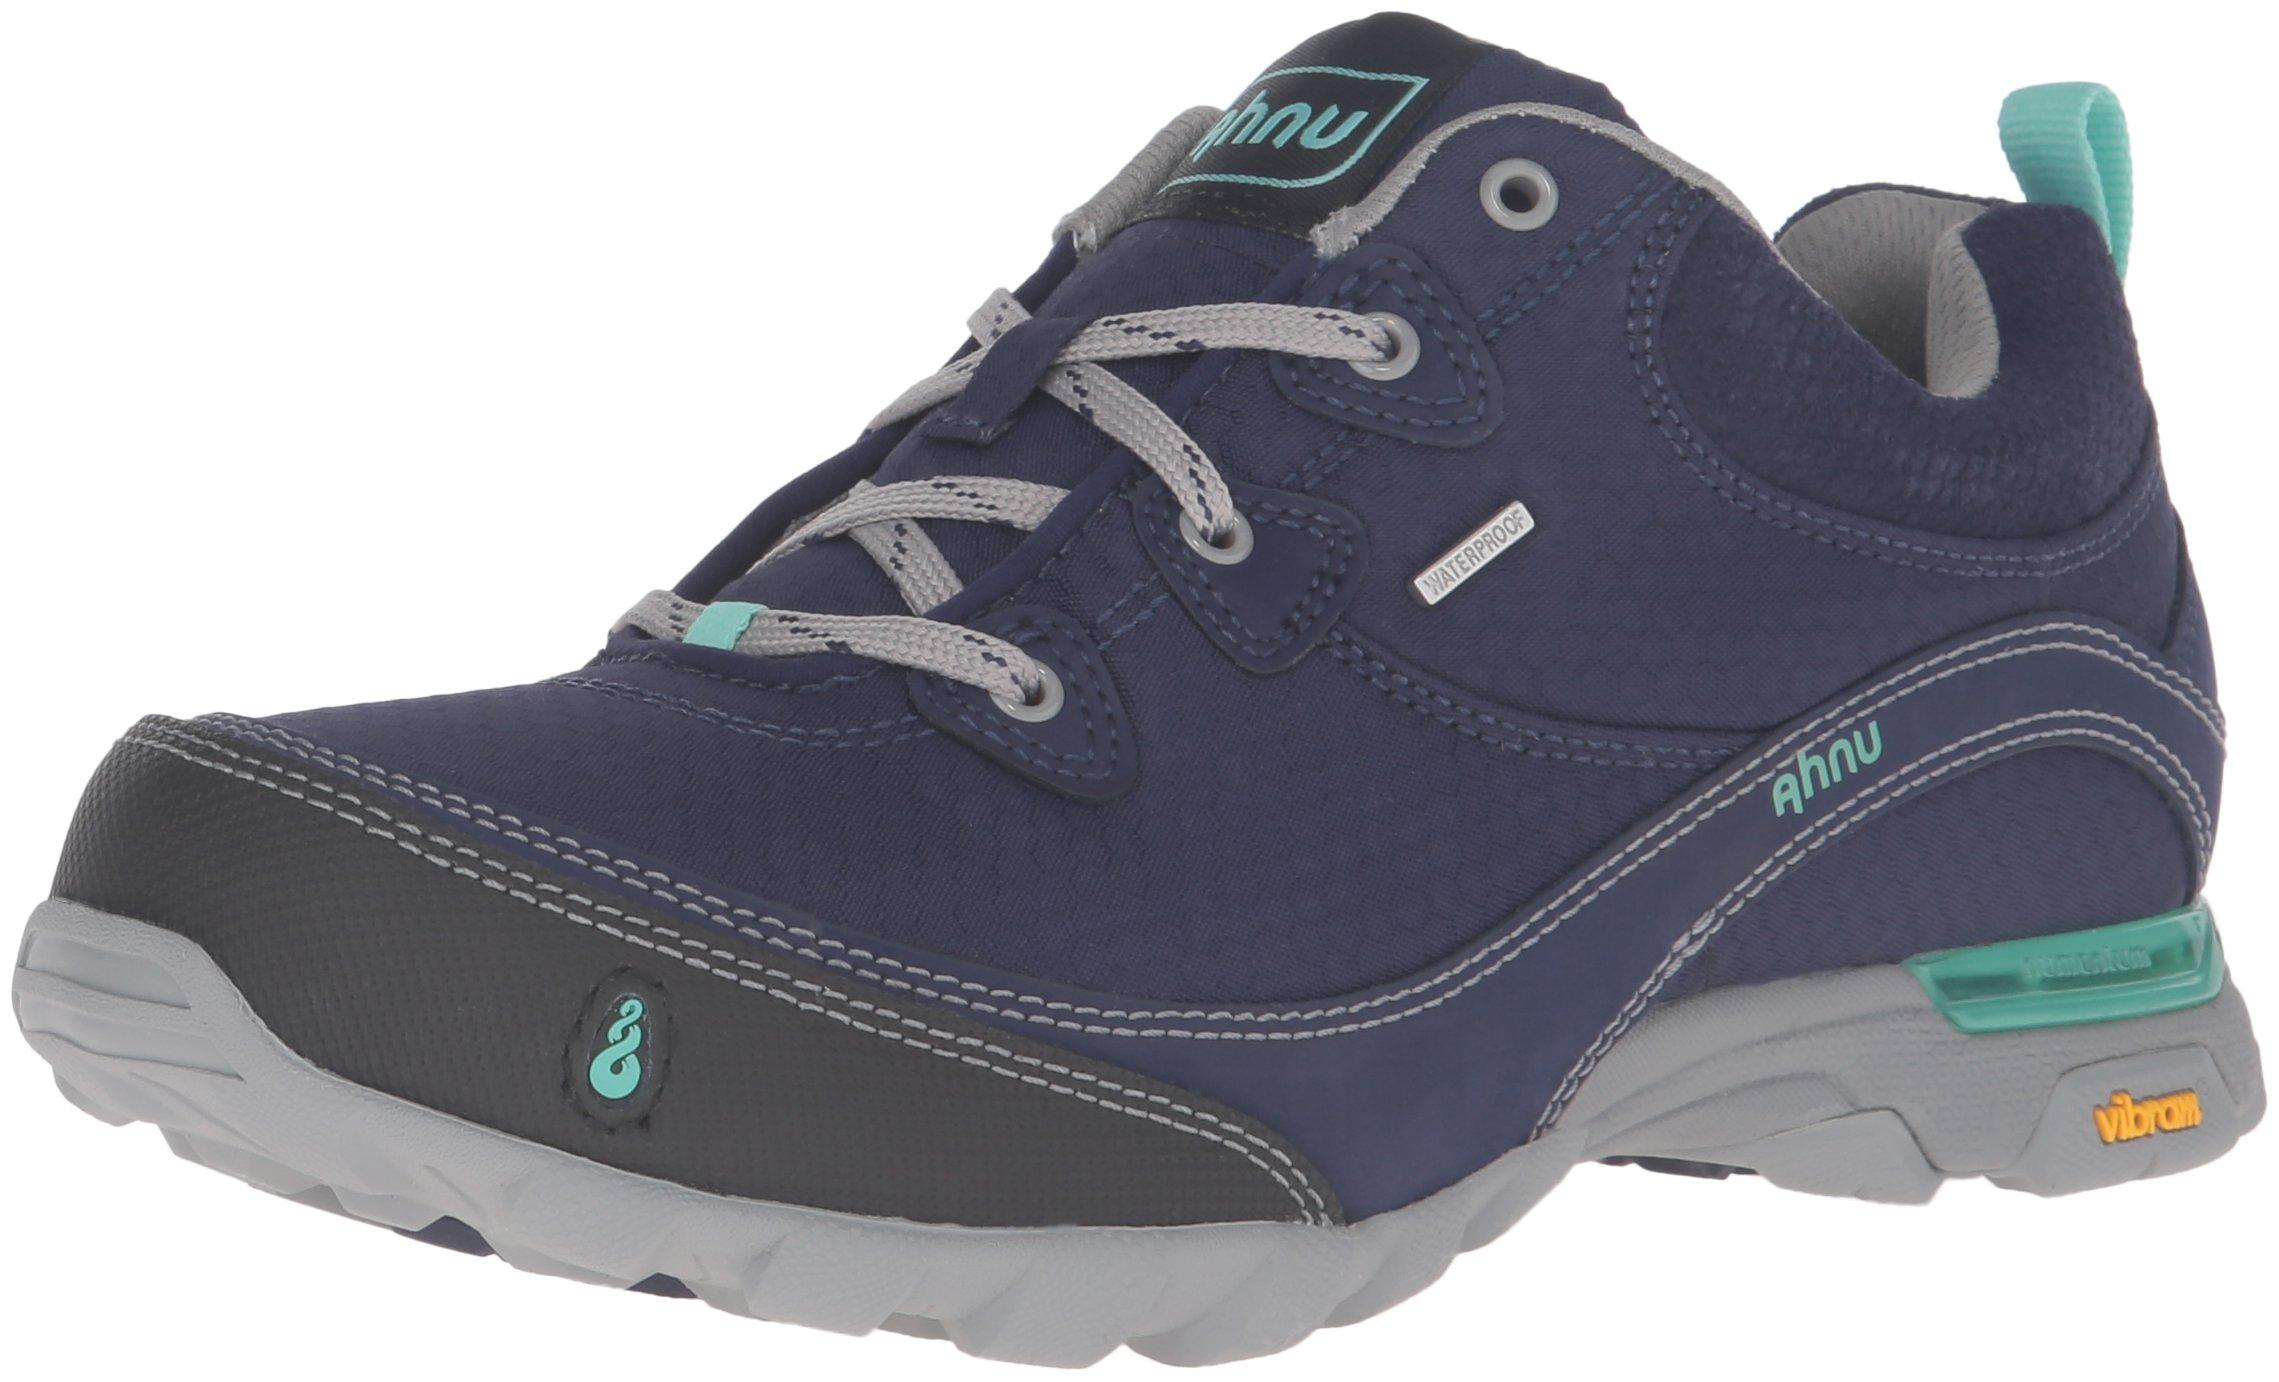 Ahnu Women's W Sugarpine Waterproof Hiking Shoe, Majestic Blue, 10 M US